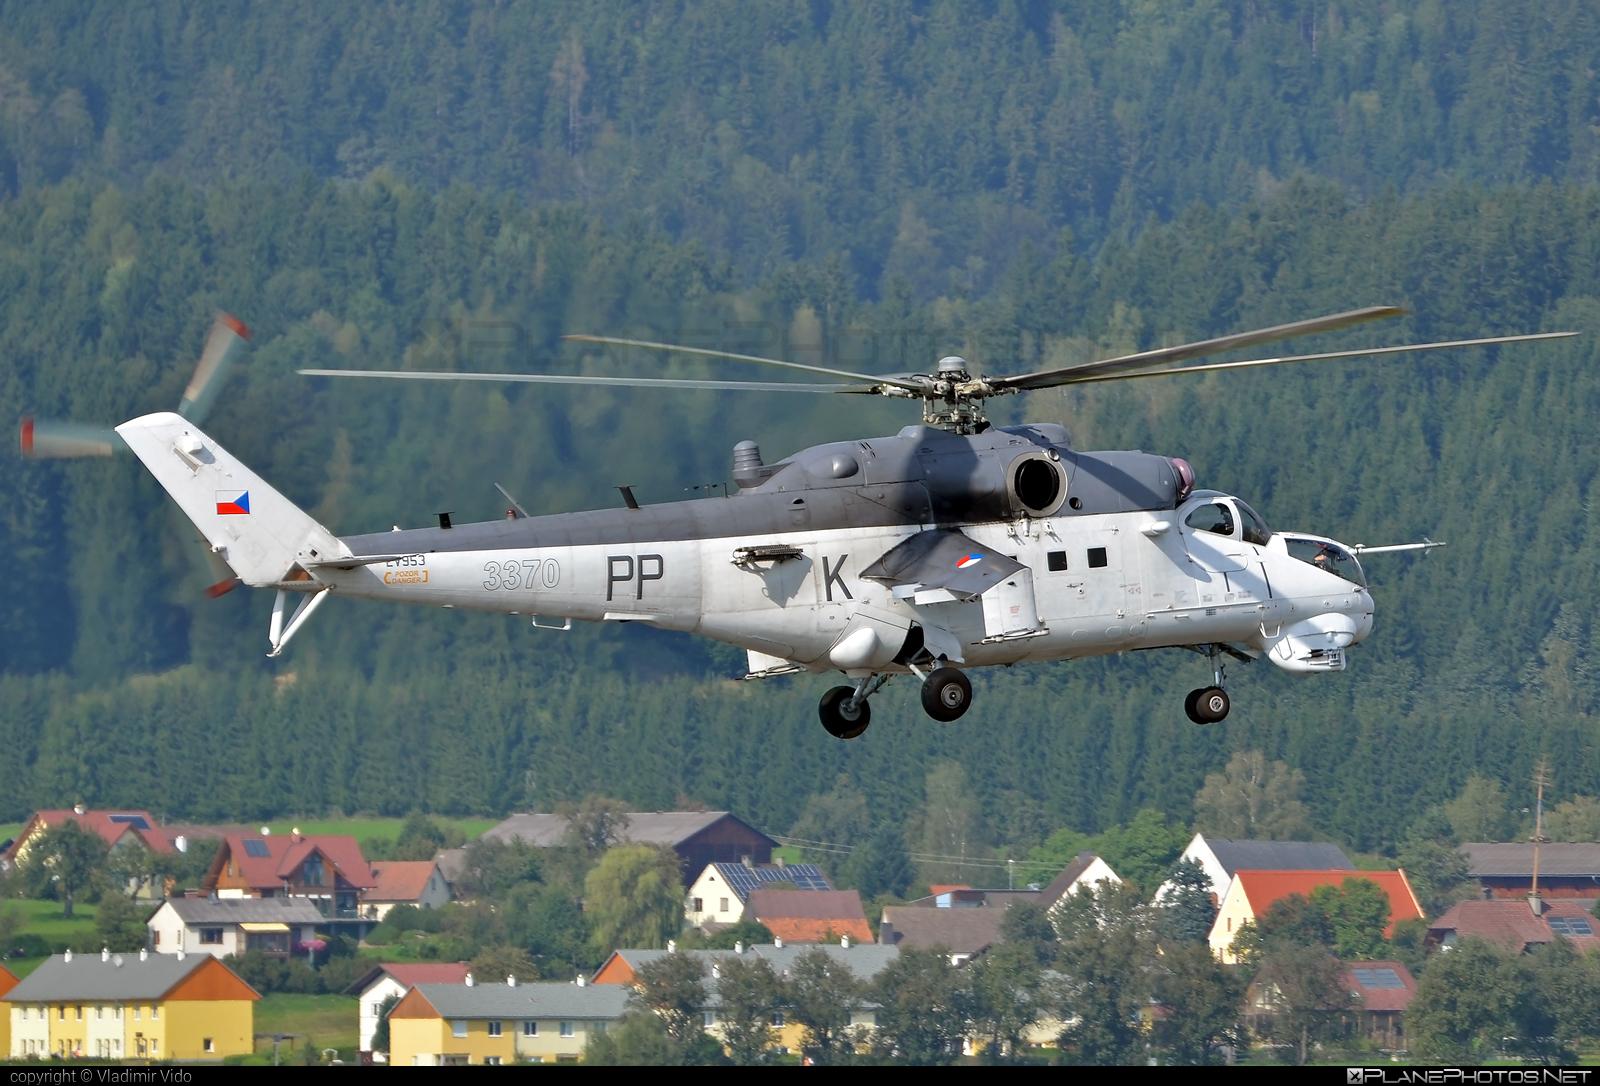 Mil Mi-35 - 3370 operated by Vzdušné síly AČR (Czech Air Force) #airpower2016 #czechairforce #mi35 #mil #milhelicopters #vzdusnesilyacr